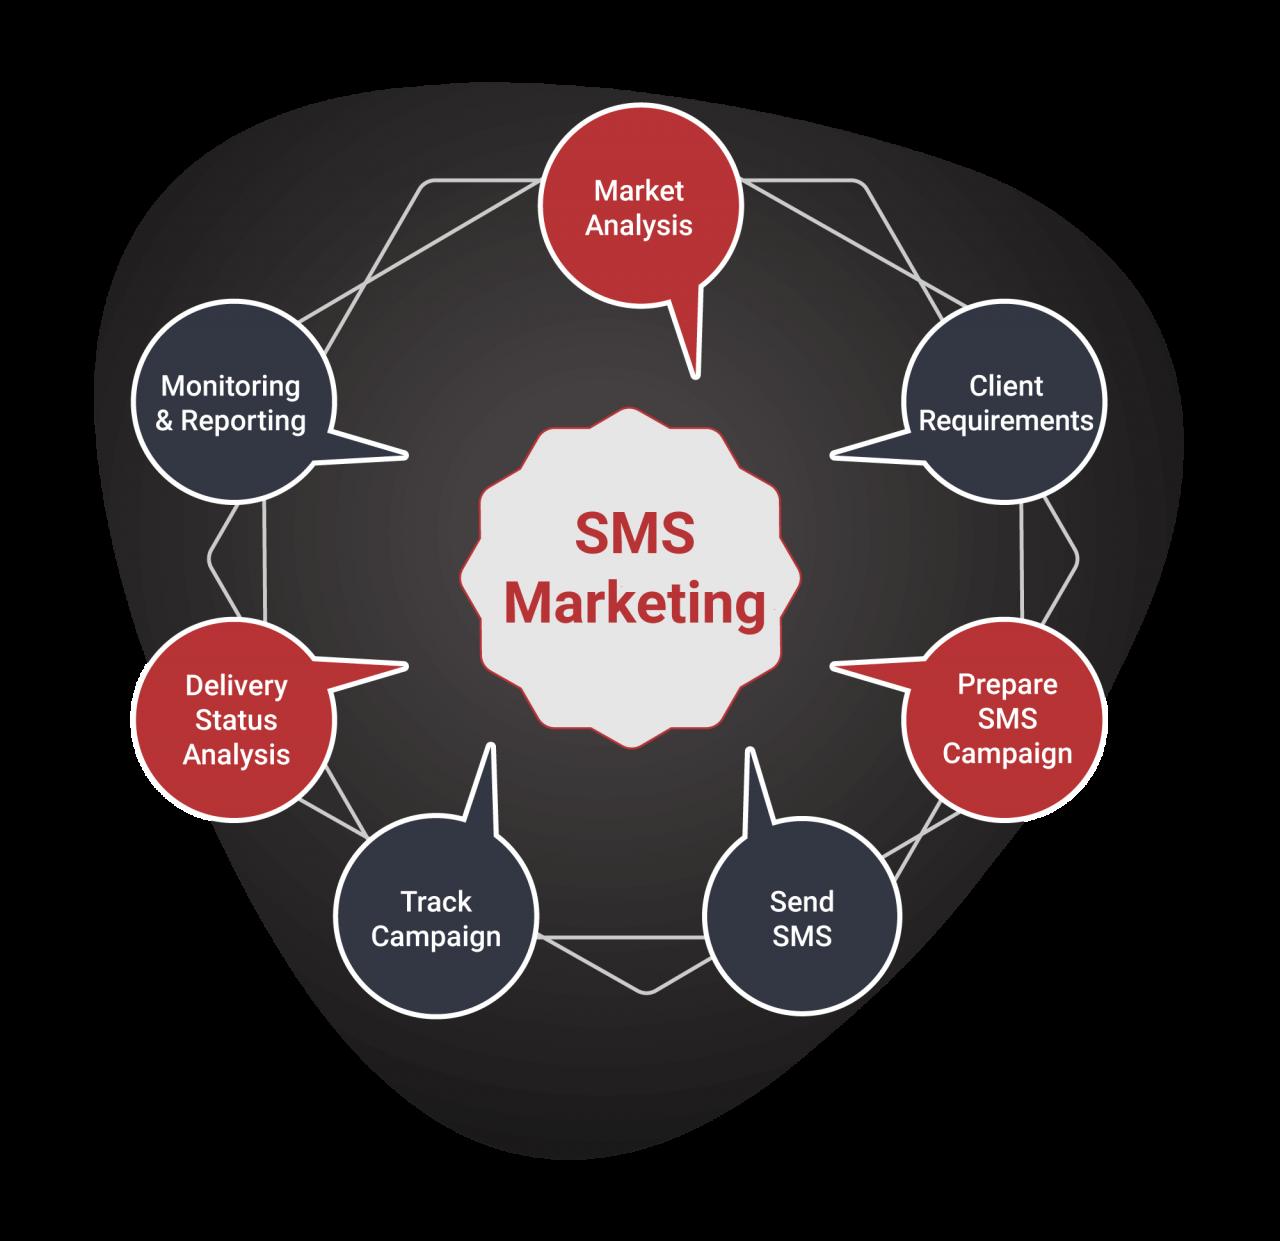 SMS Marketing Work Process